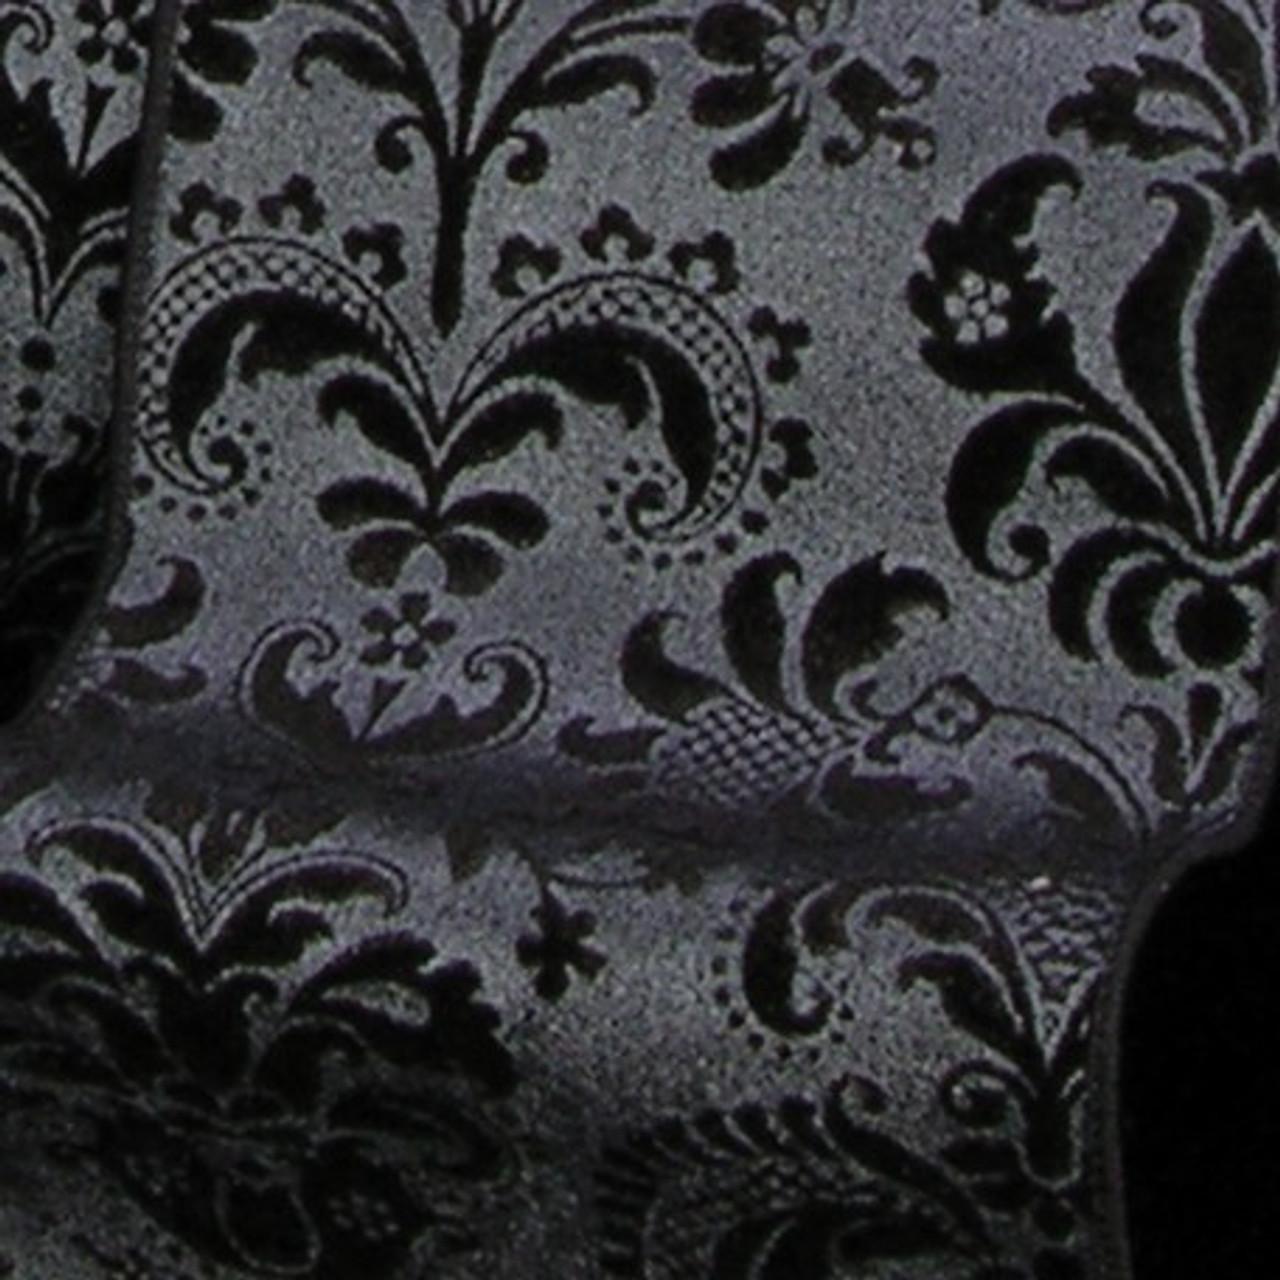 Jet Black Shiny Brocade Fabric Print Design Wired Polyester Craft